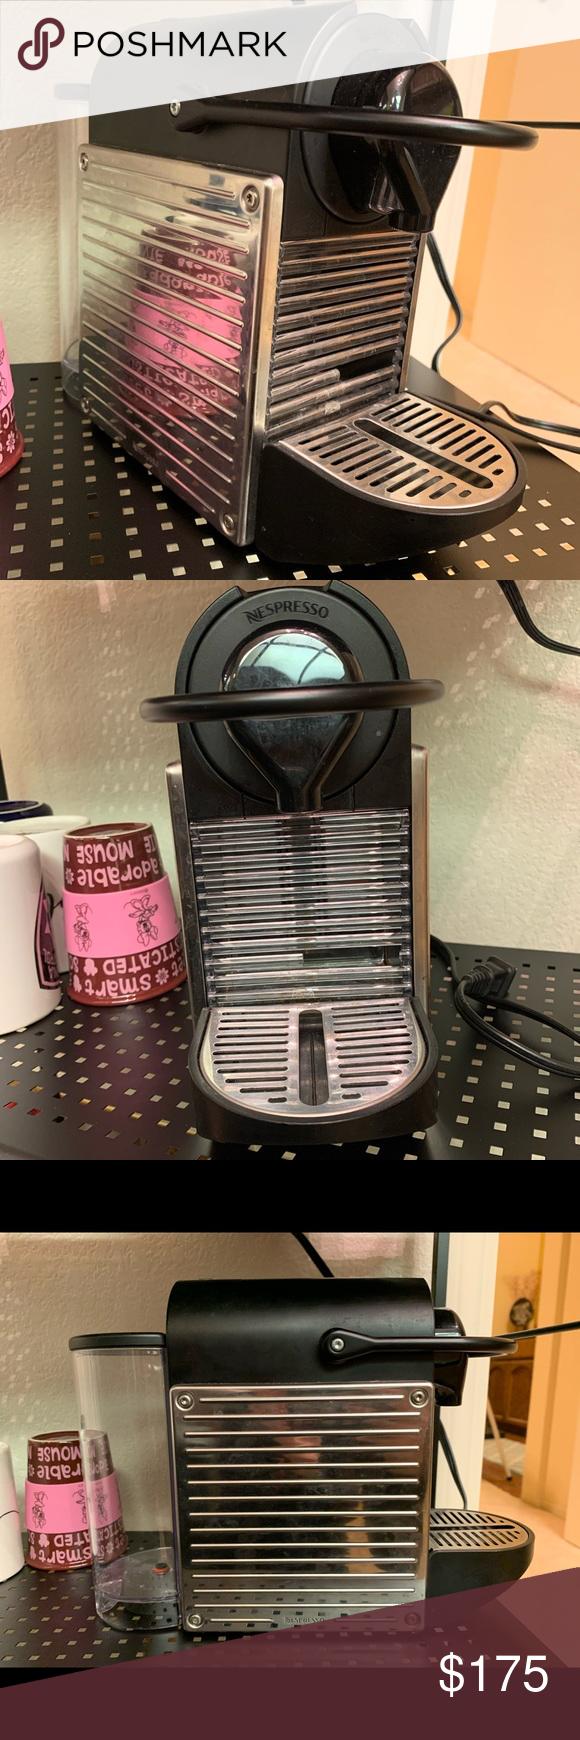 Nespresso Pixie Electric Titan Model Nespresso Single Cup